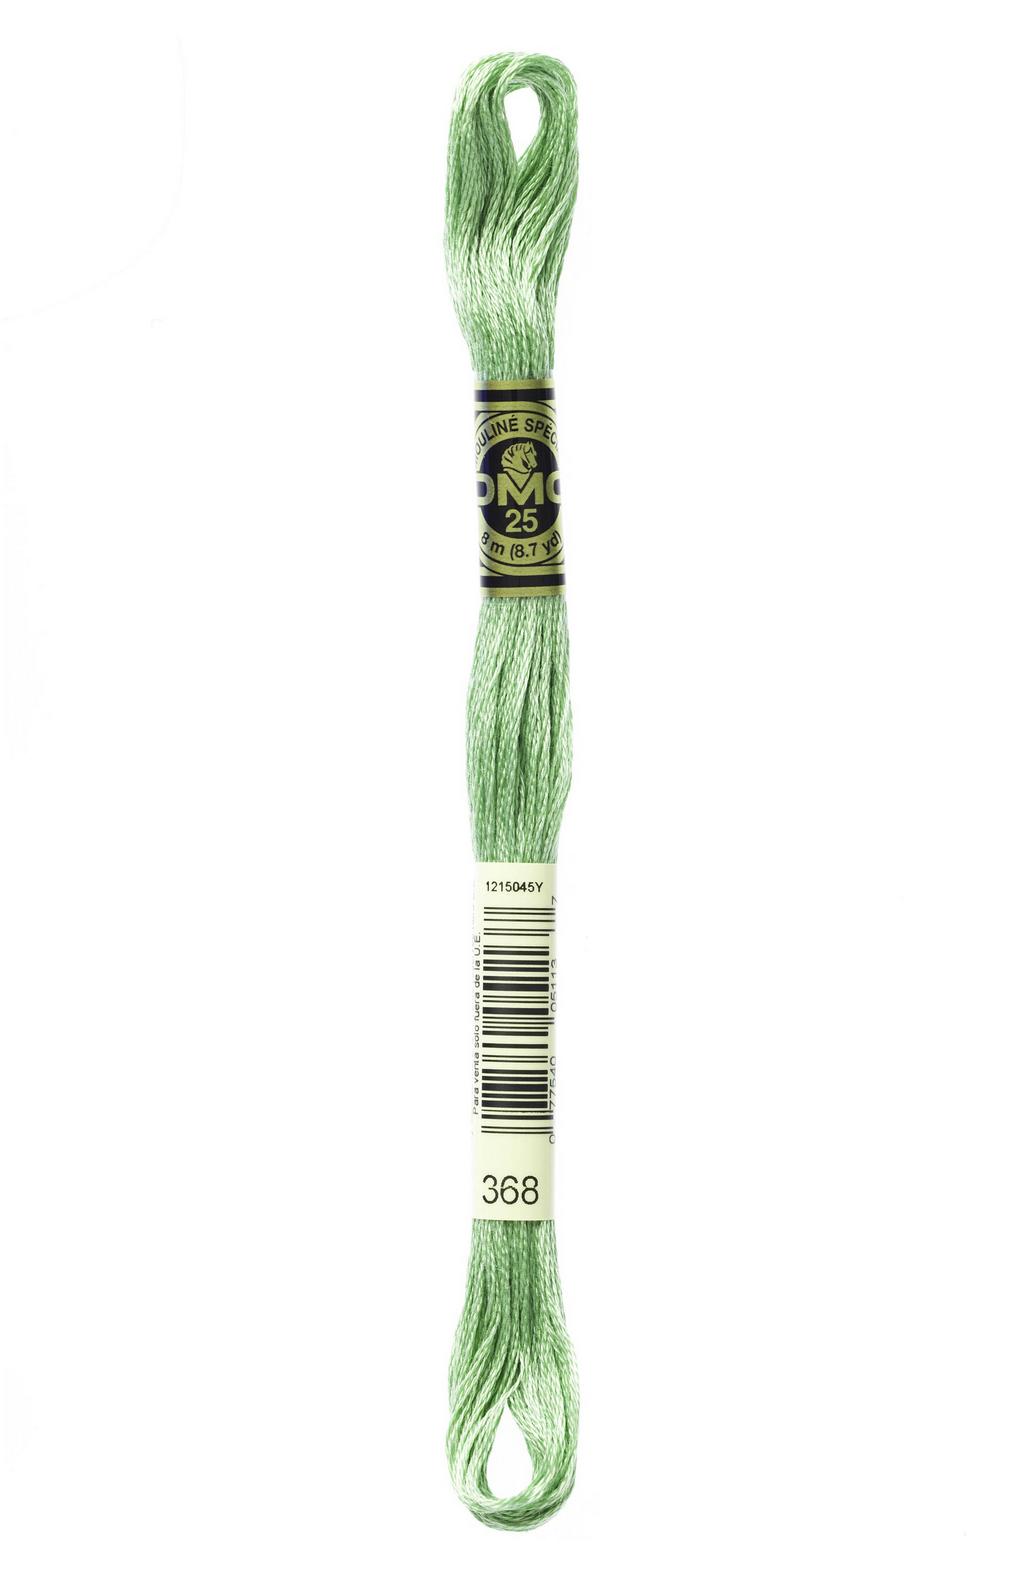 #368 - DMC 6 Strand Embroidery Floss